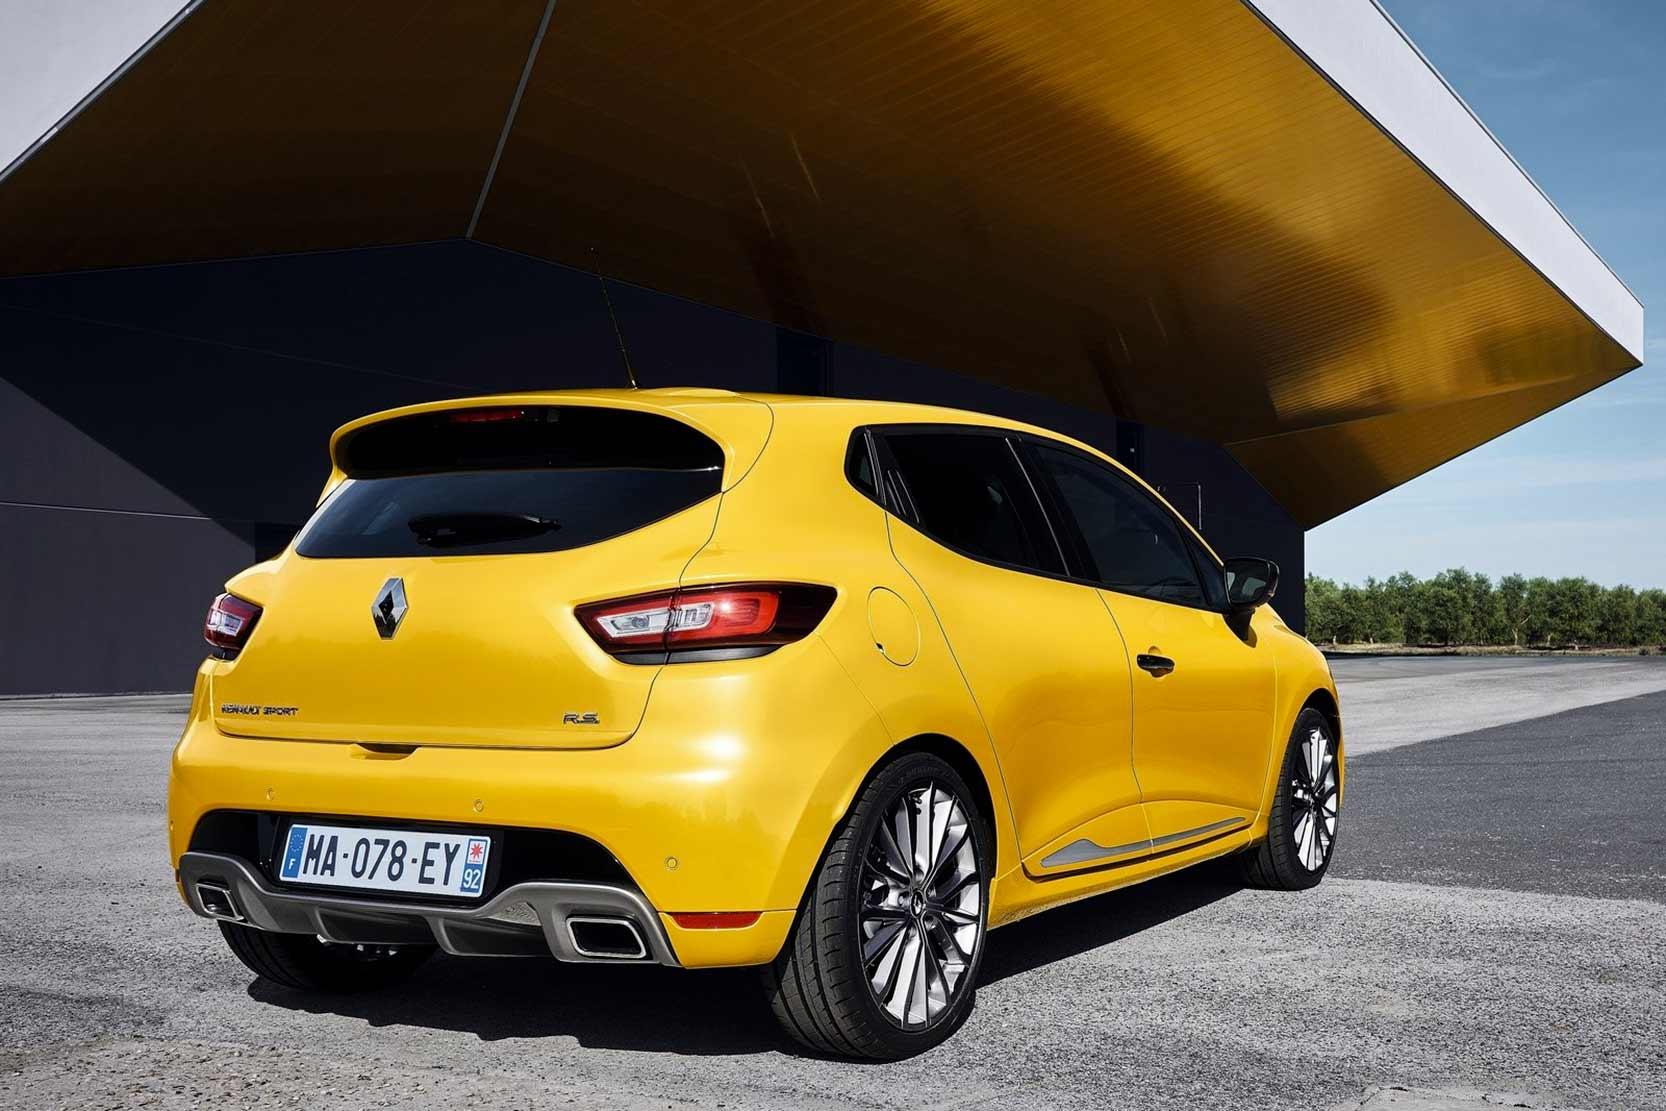 Fiche Technique Renault Clio 1 2 Tce 120 2018